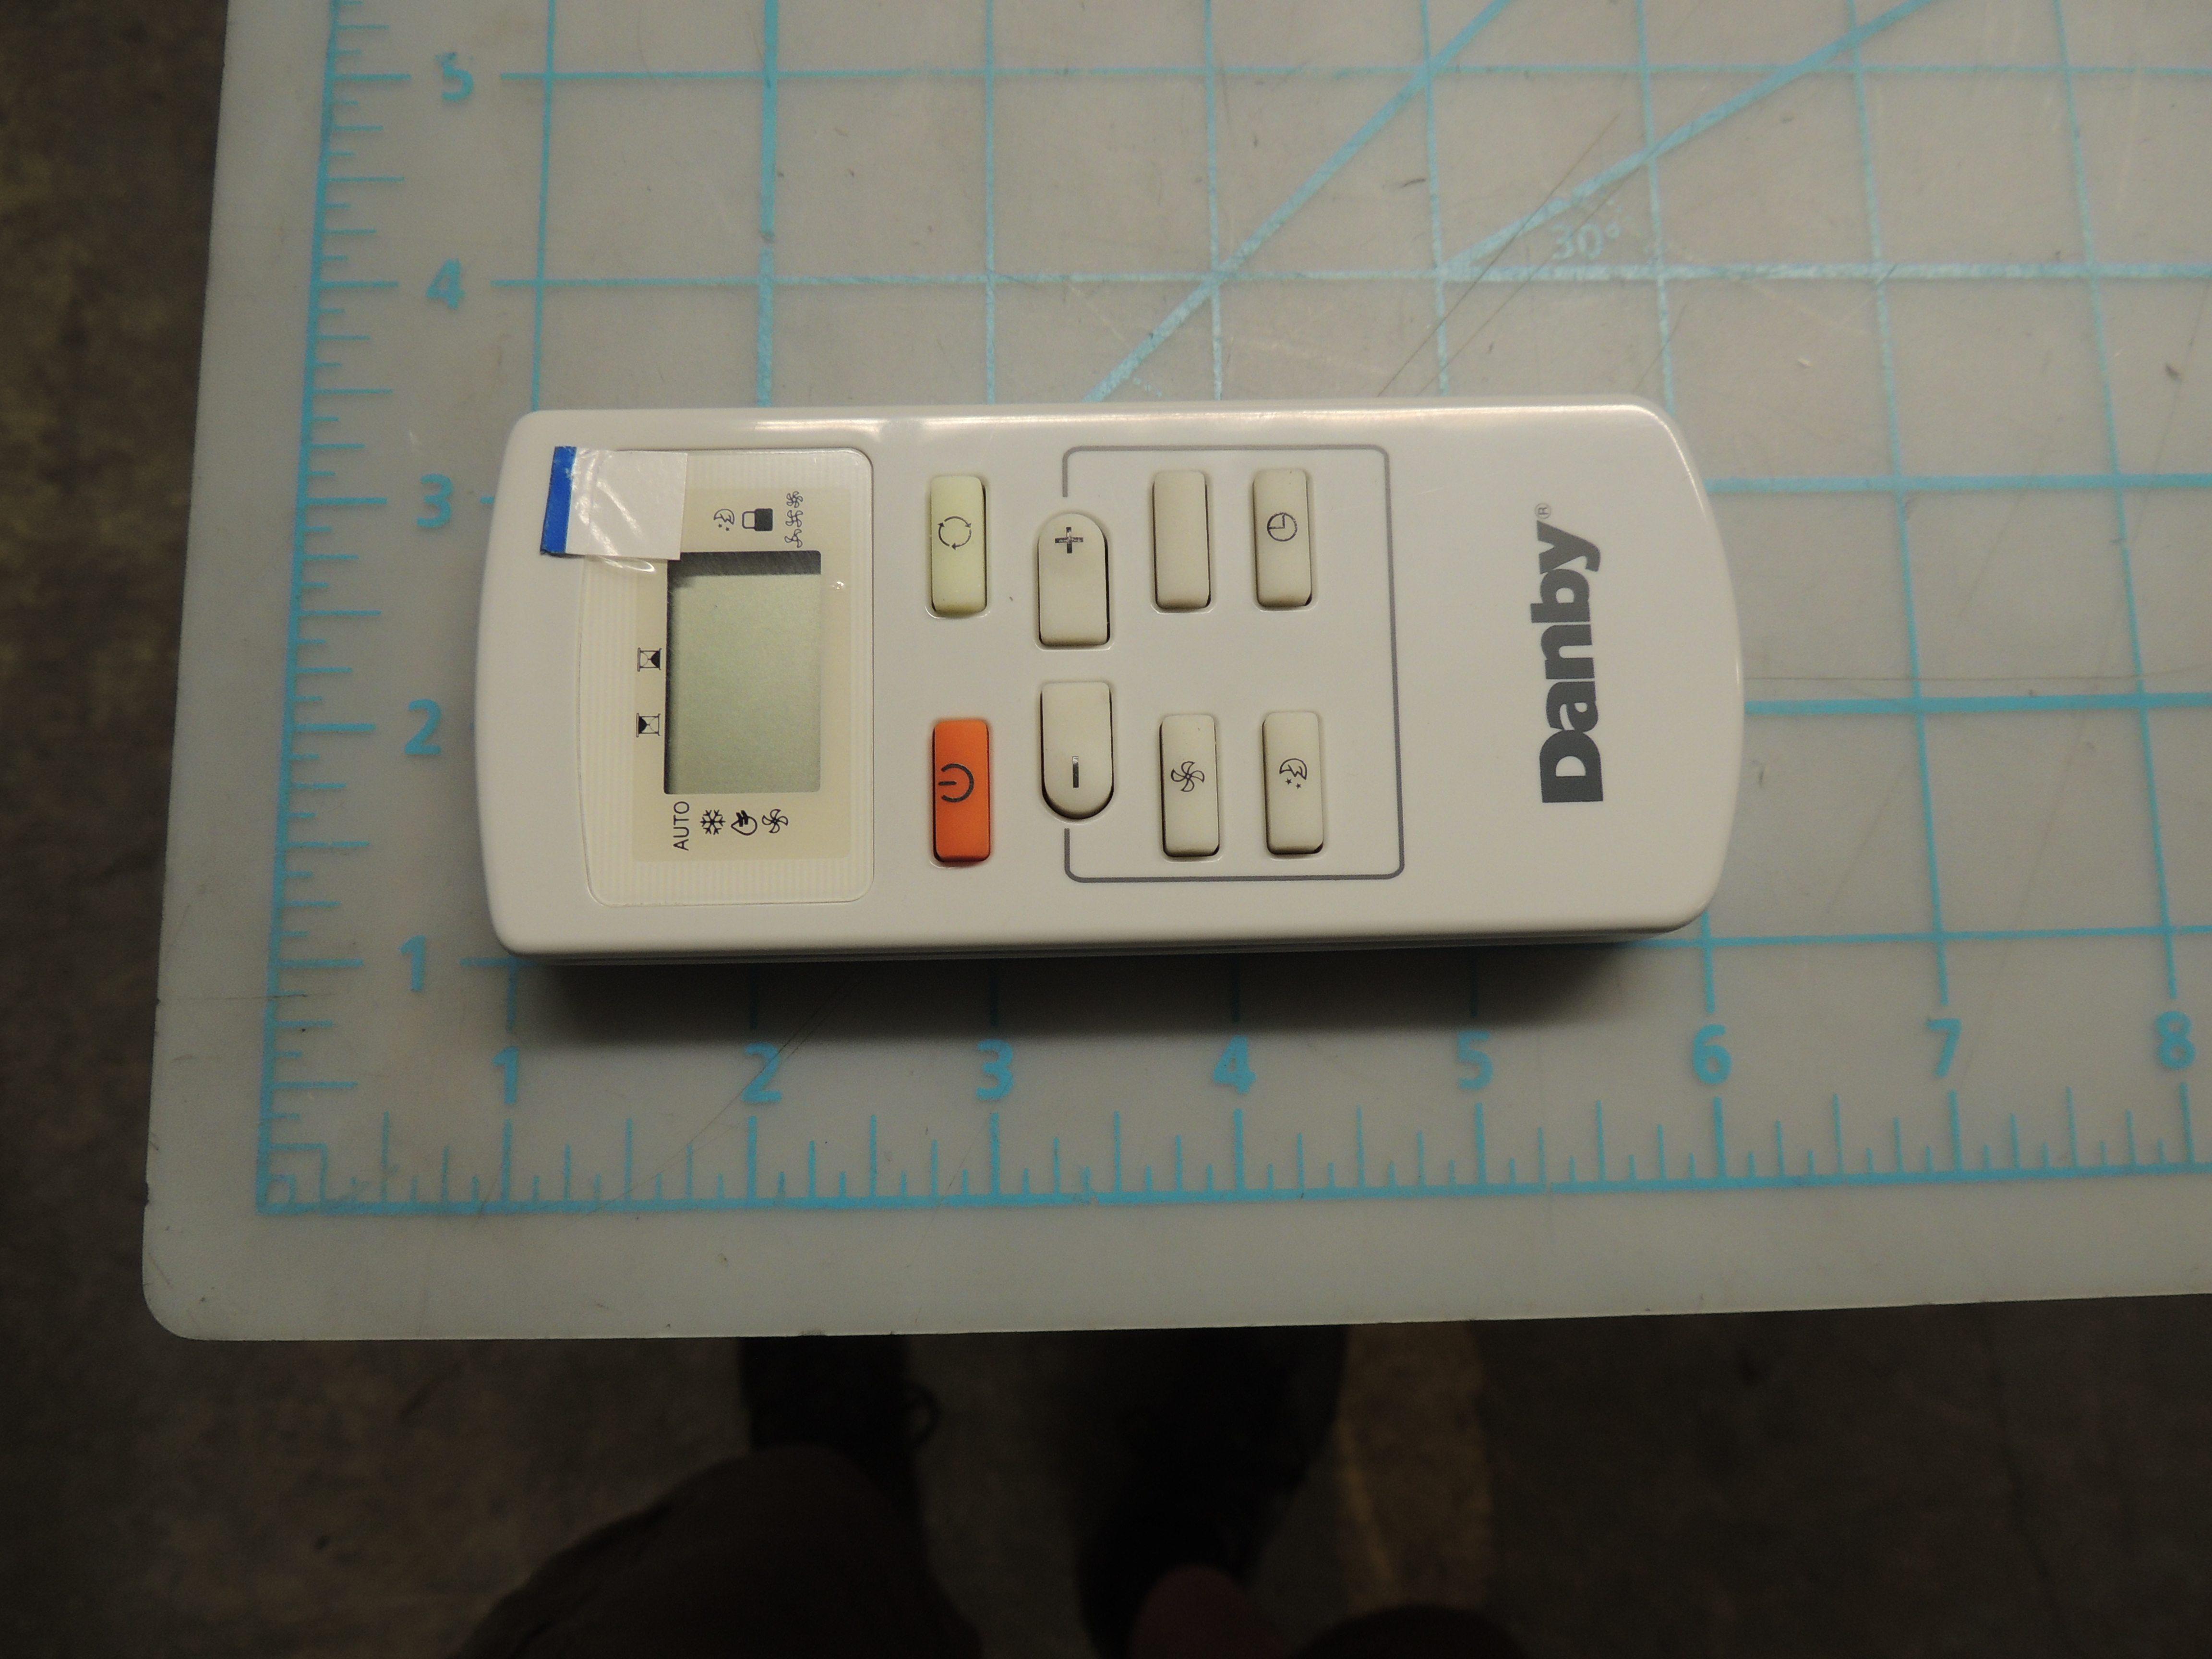 DPAC REMOTE CONTROLLER